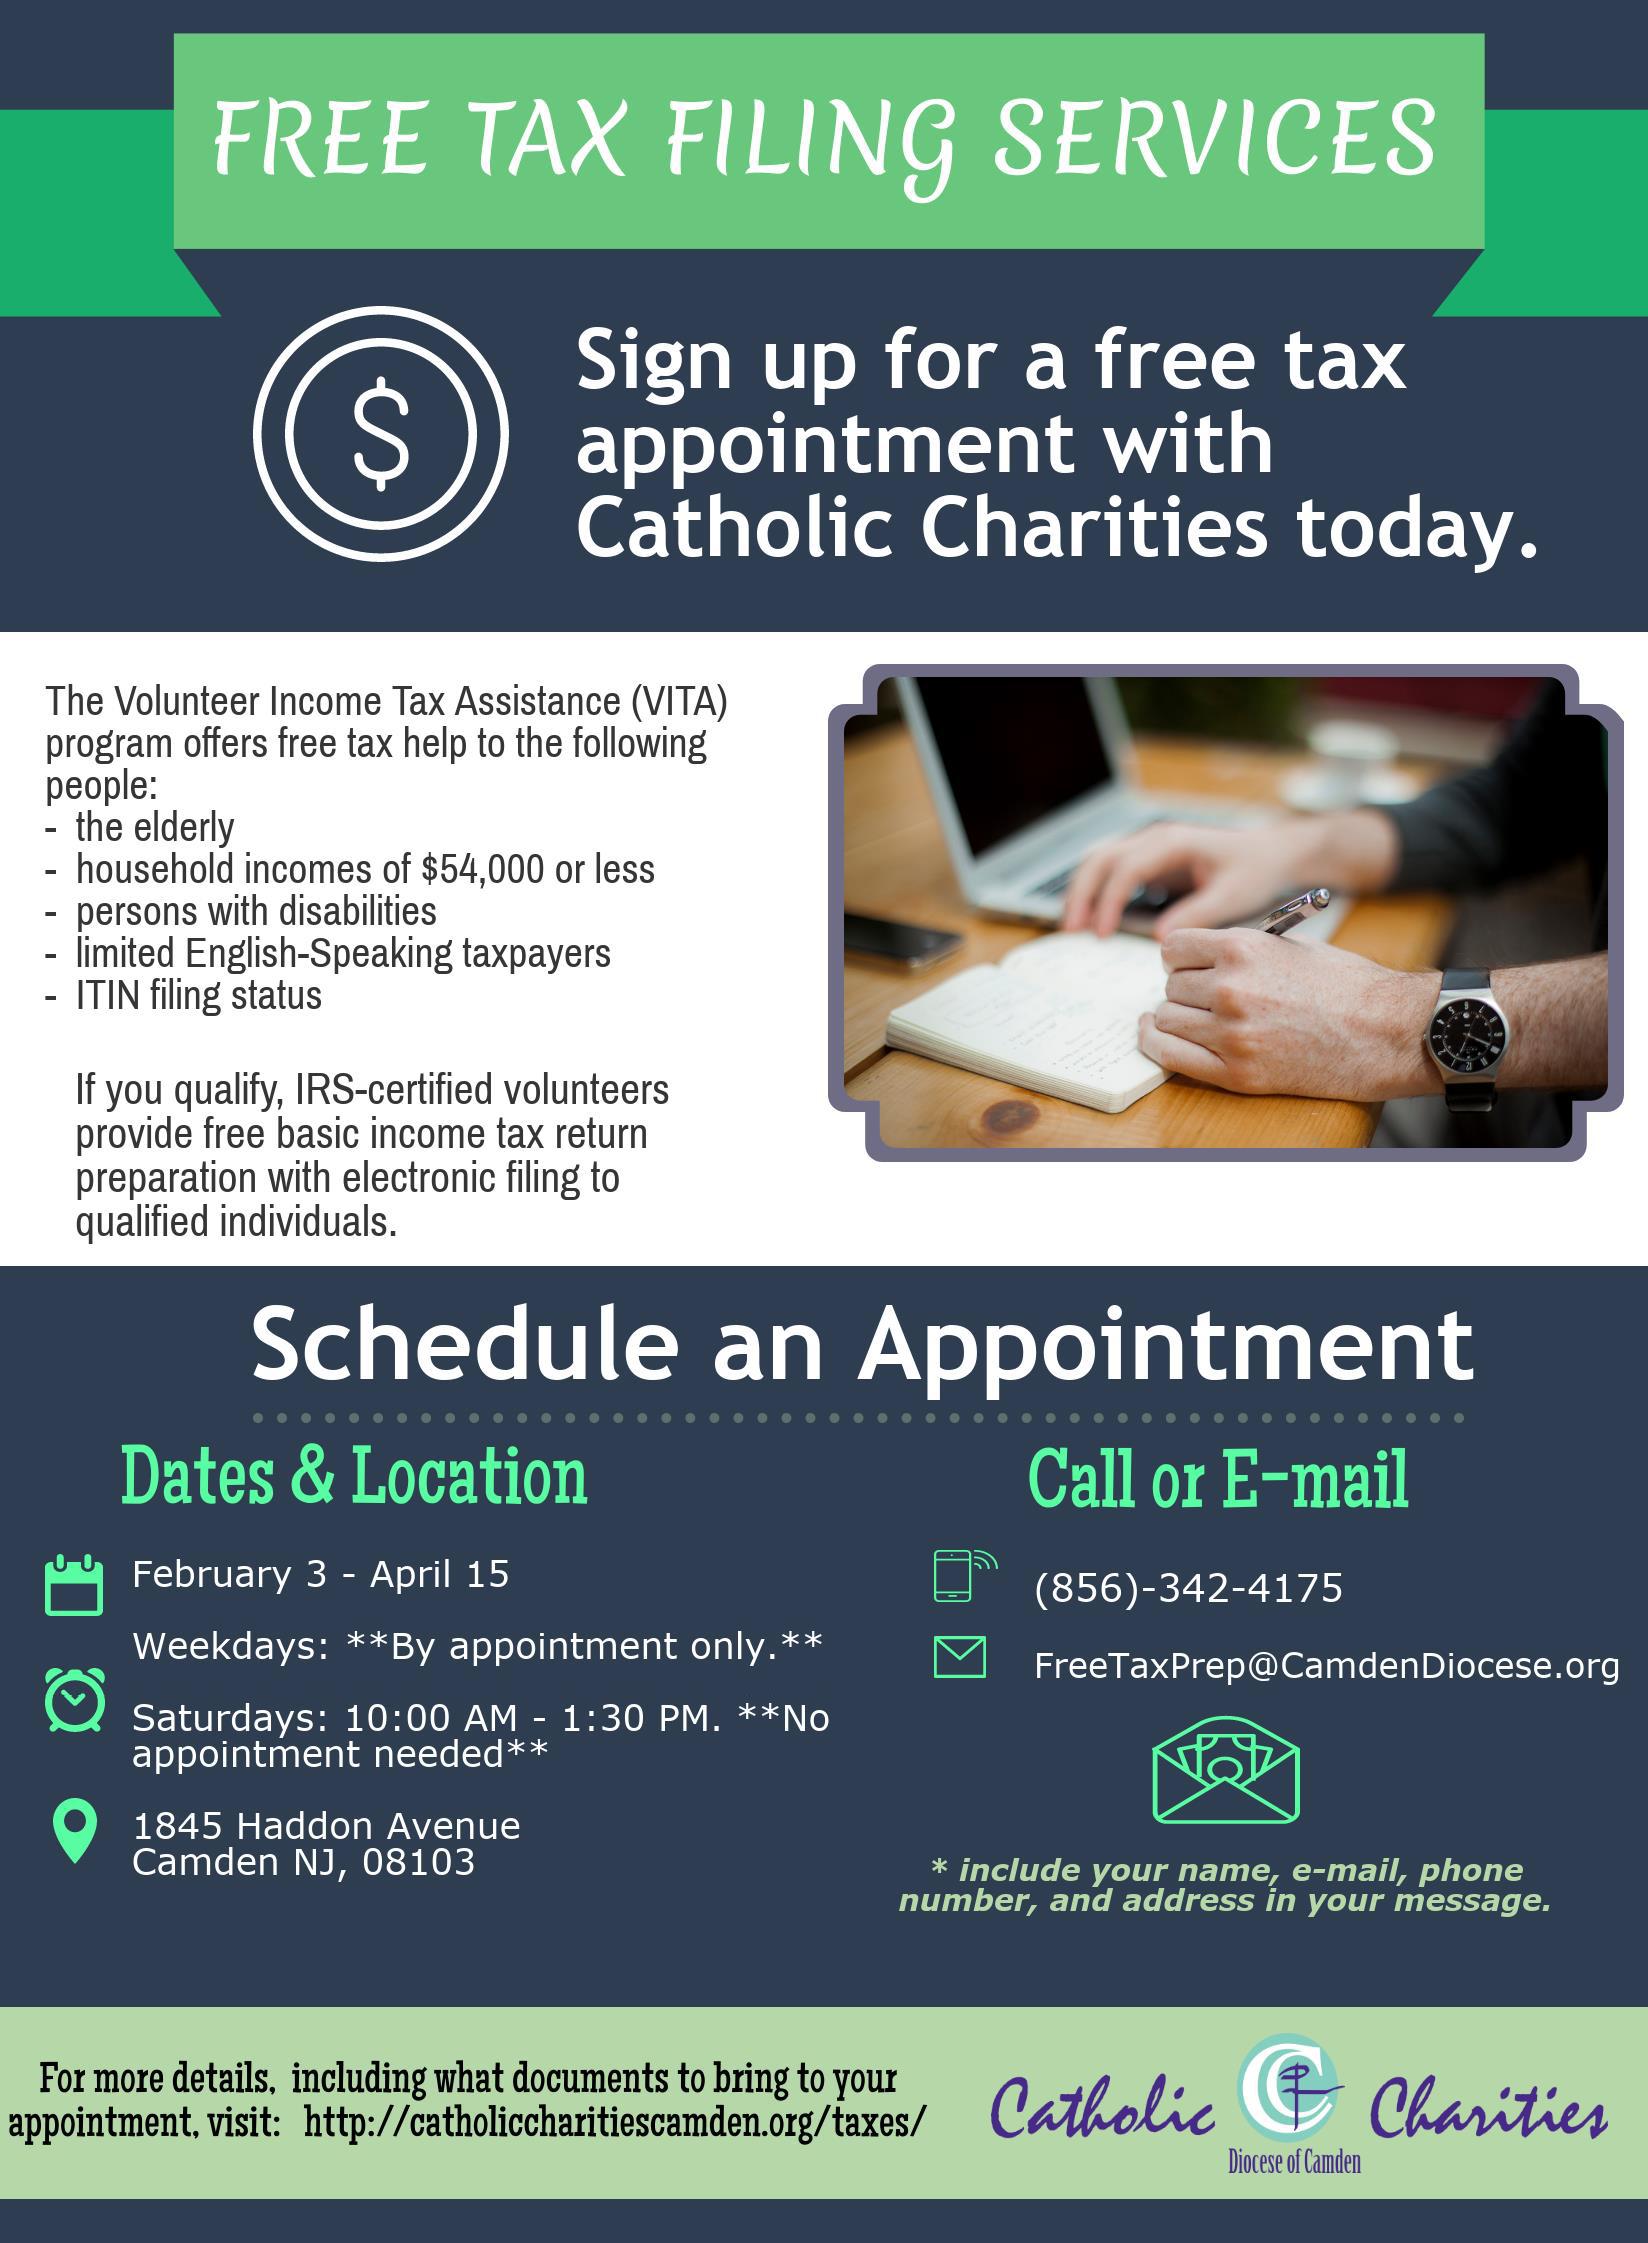 Free Tax Filing Services At Catholic Charities Catholic Charities